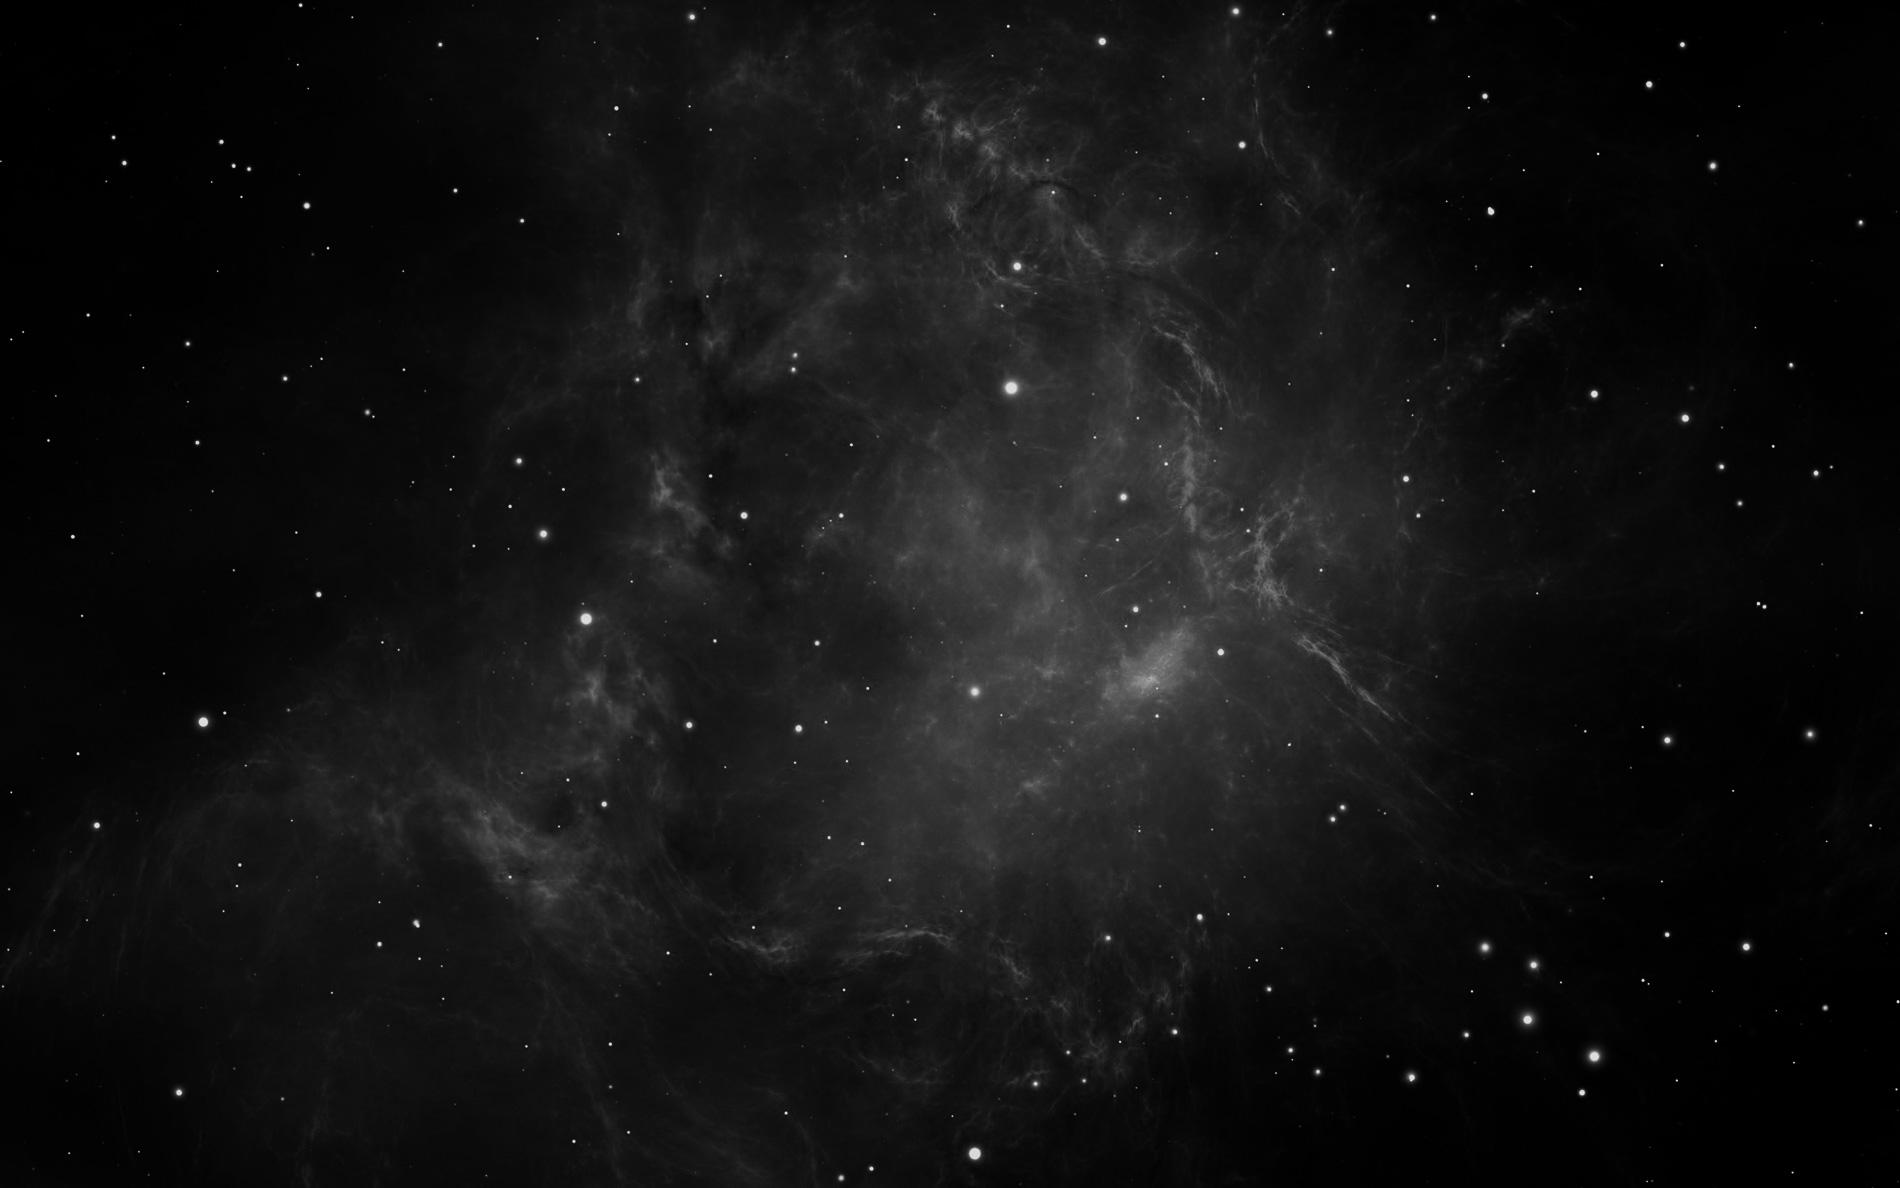 black star wallpaper  Black-Star-Wallpaper